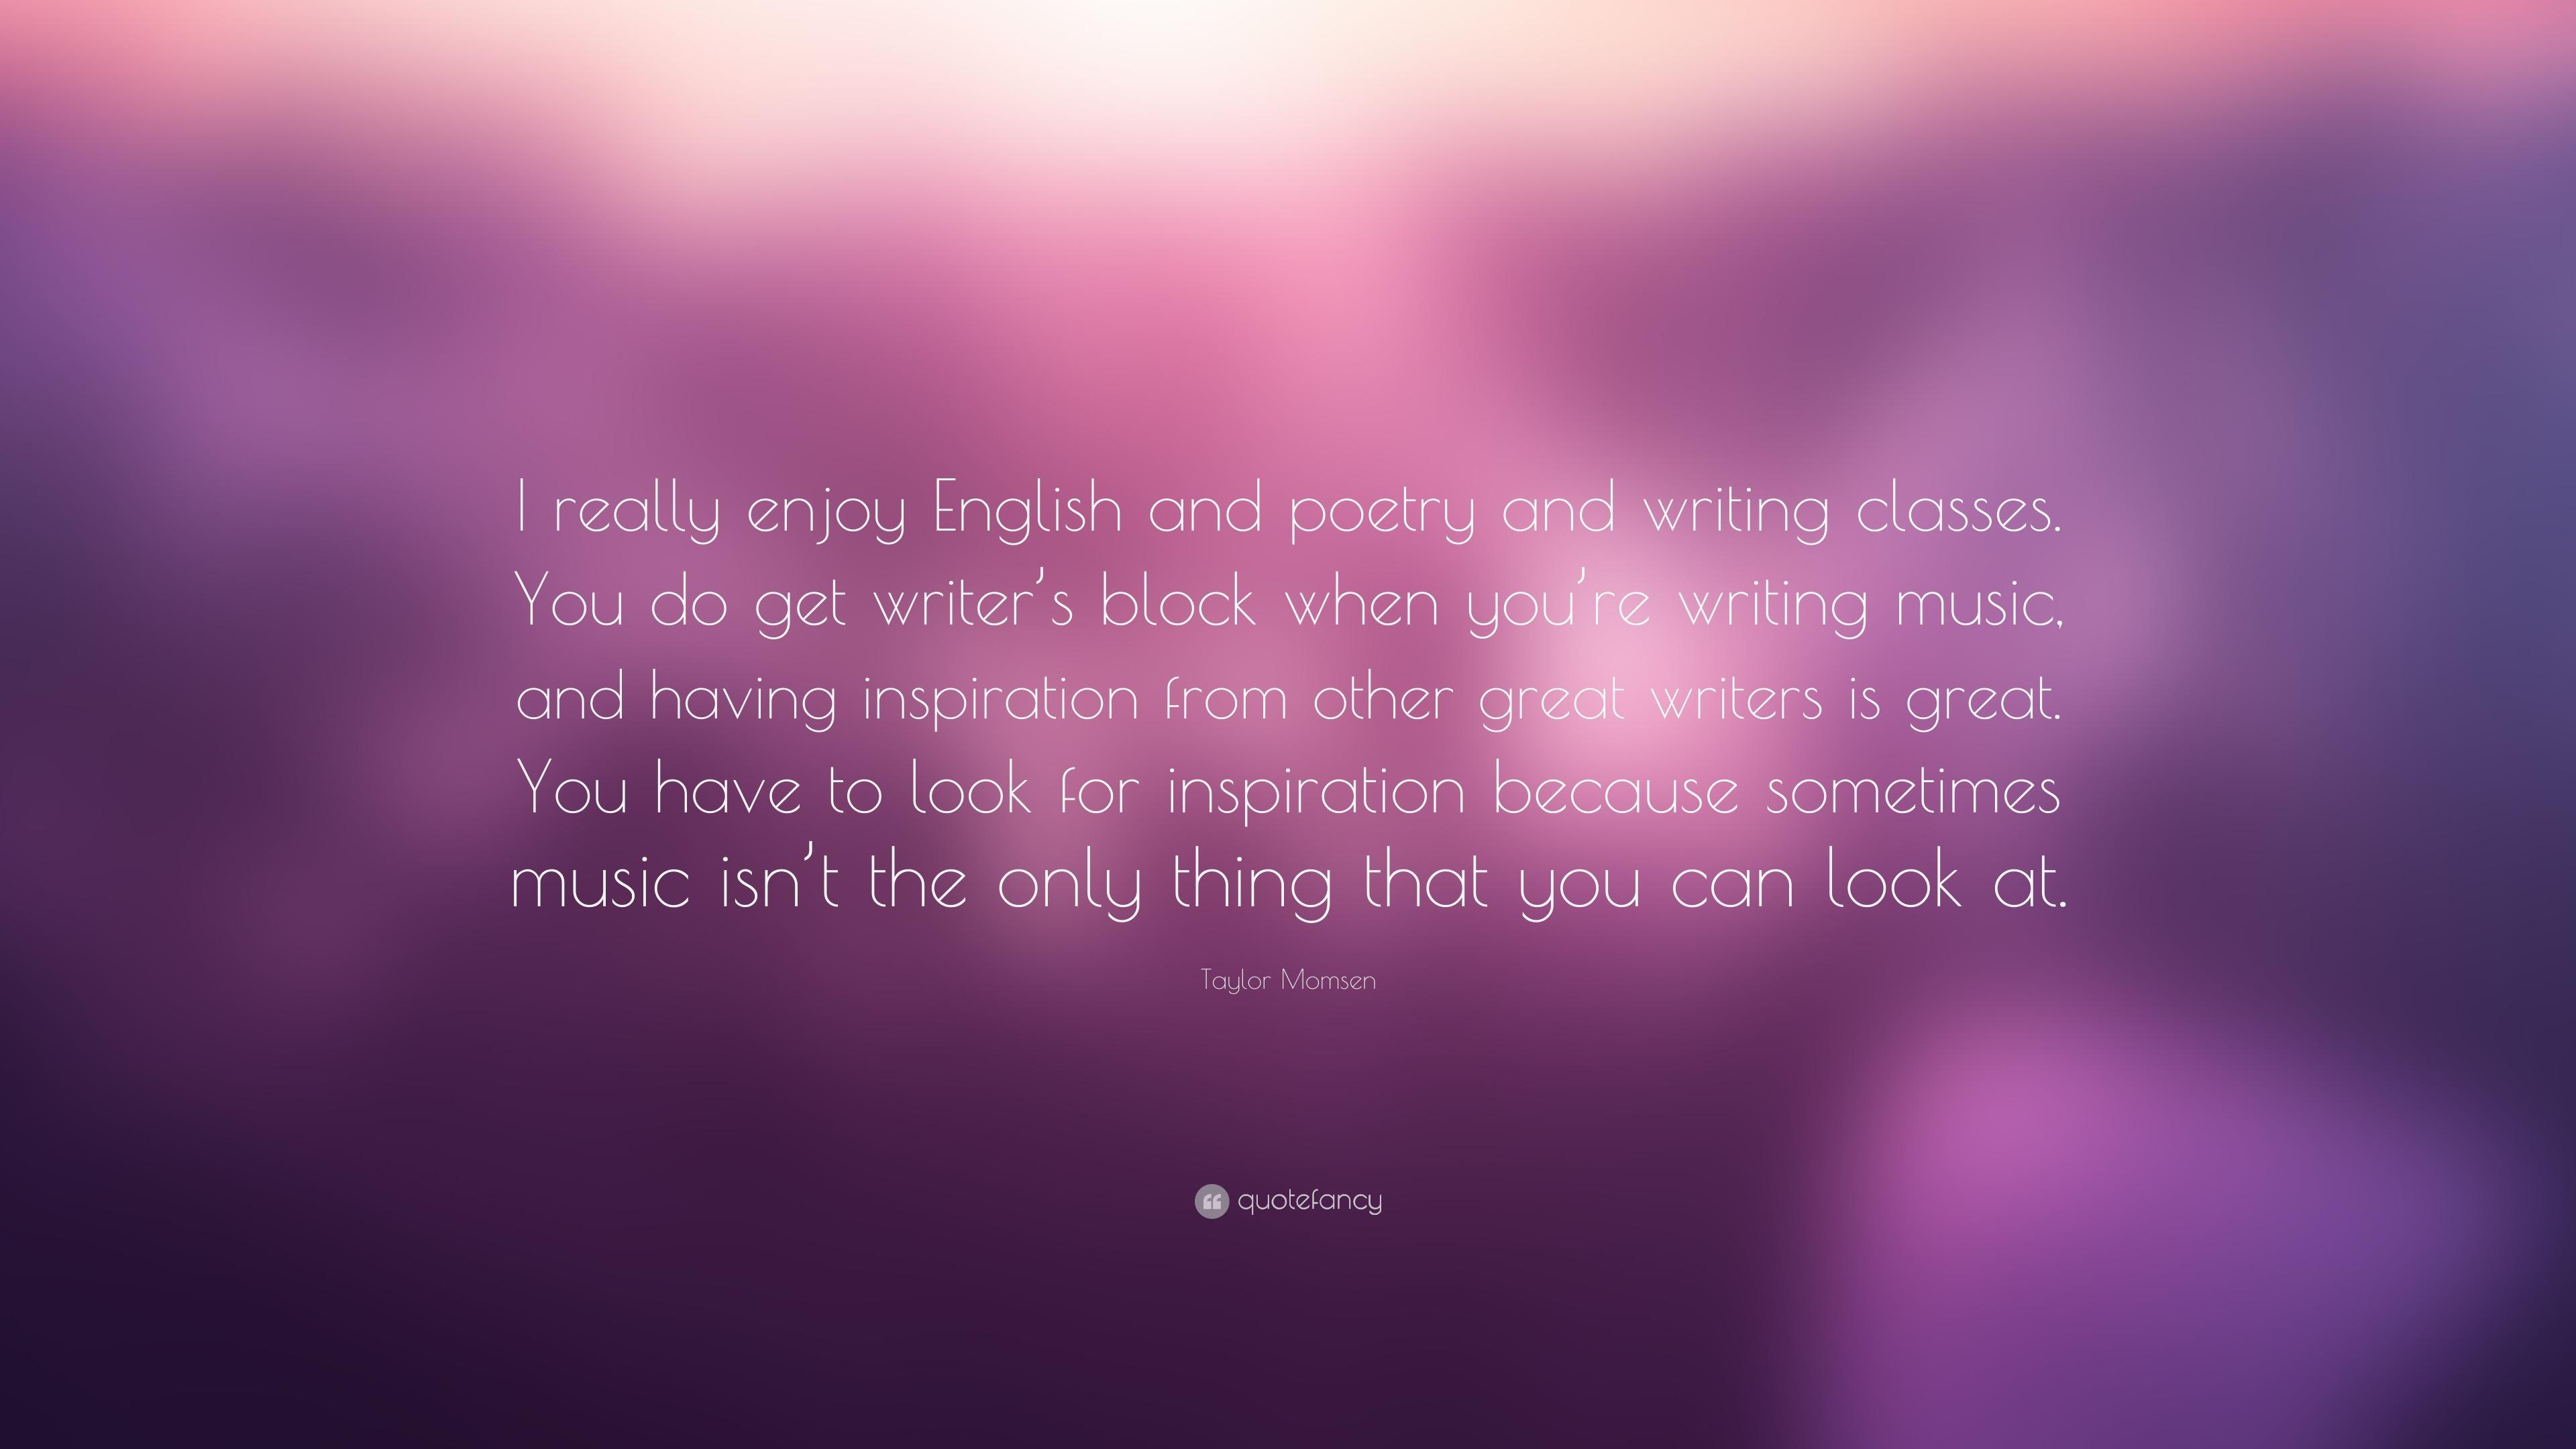 writing music inspiration